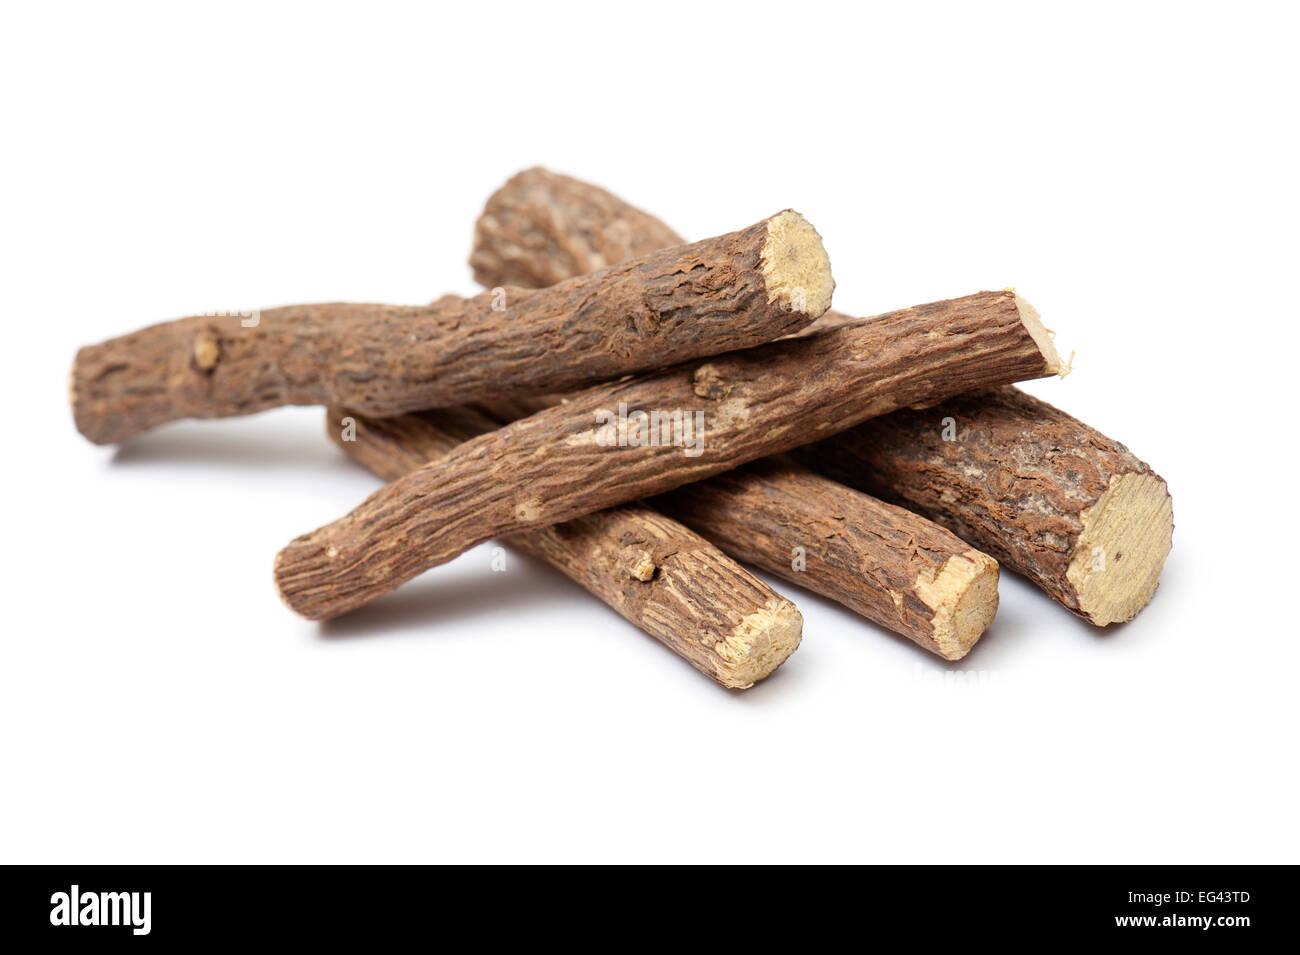 liquorice root, on white background - Stock Image